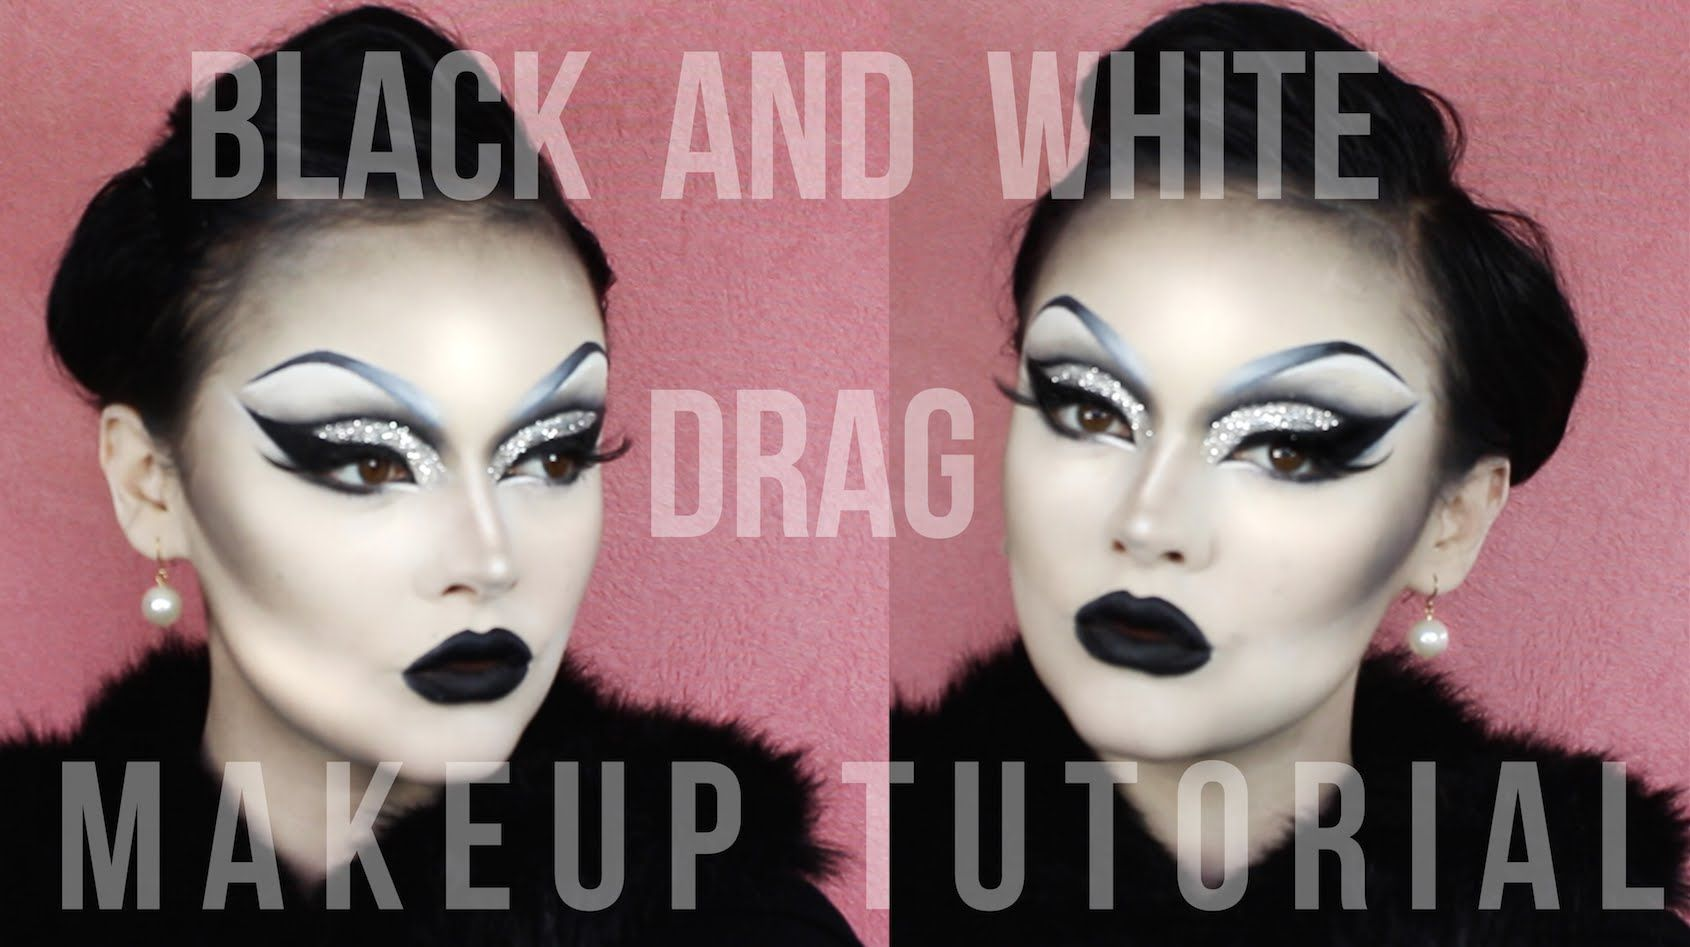 Black and white film noir inspired drag makeup tutorial black and white film noir inspired drag makeup tutorial baditri Images